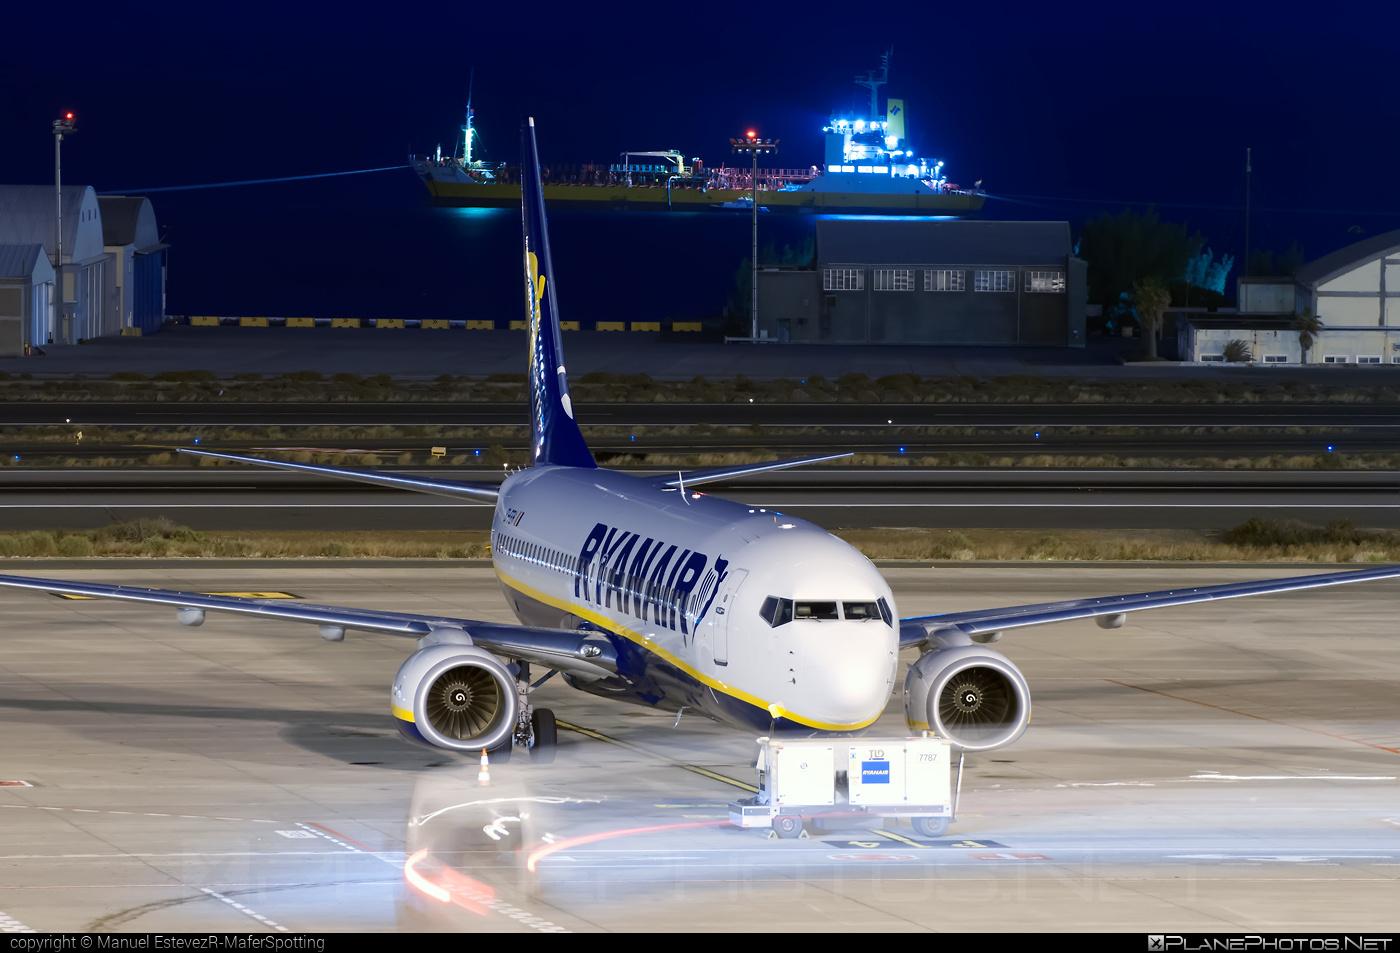 Boeing 737-800 - EI-FEH operated by Ryanair #b737 #b737nextgen #b737ng #boeing #boeing737 #ryanair